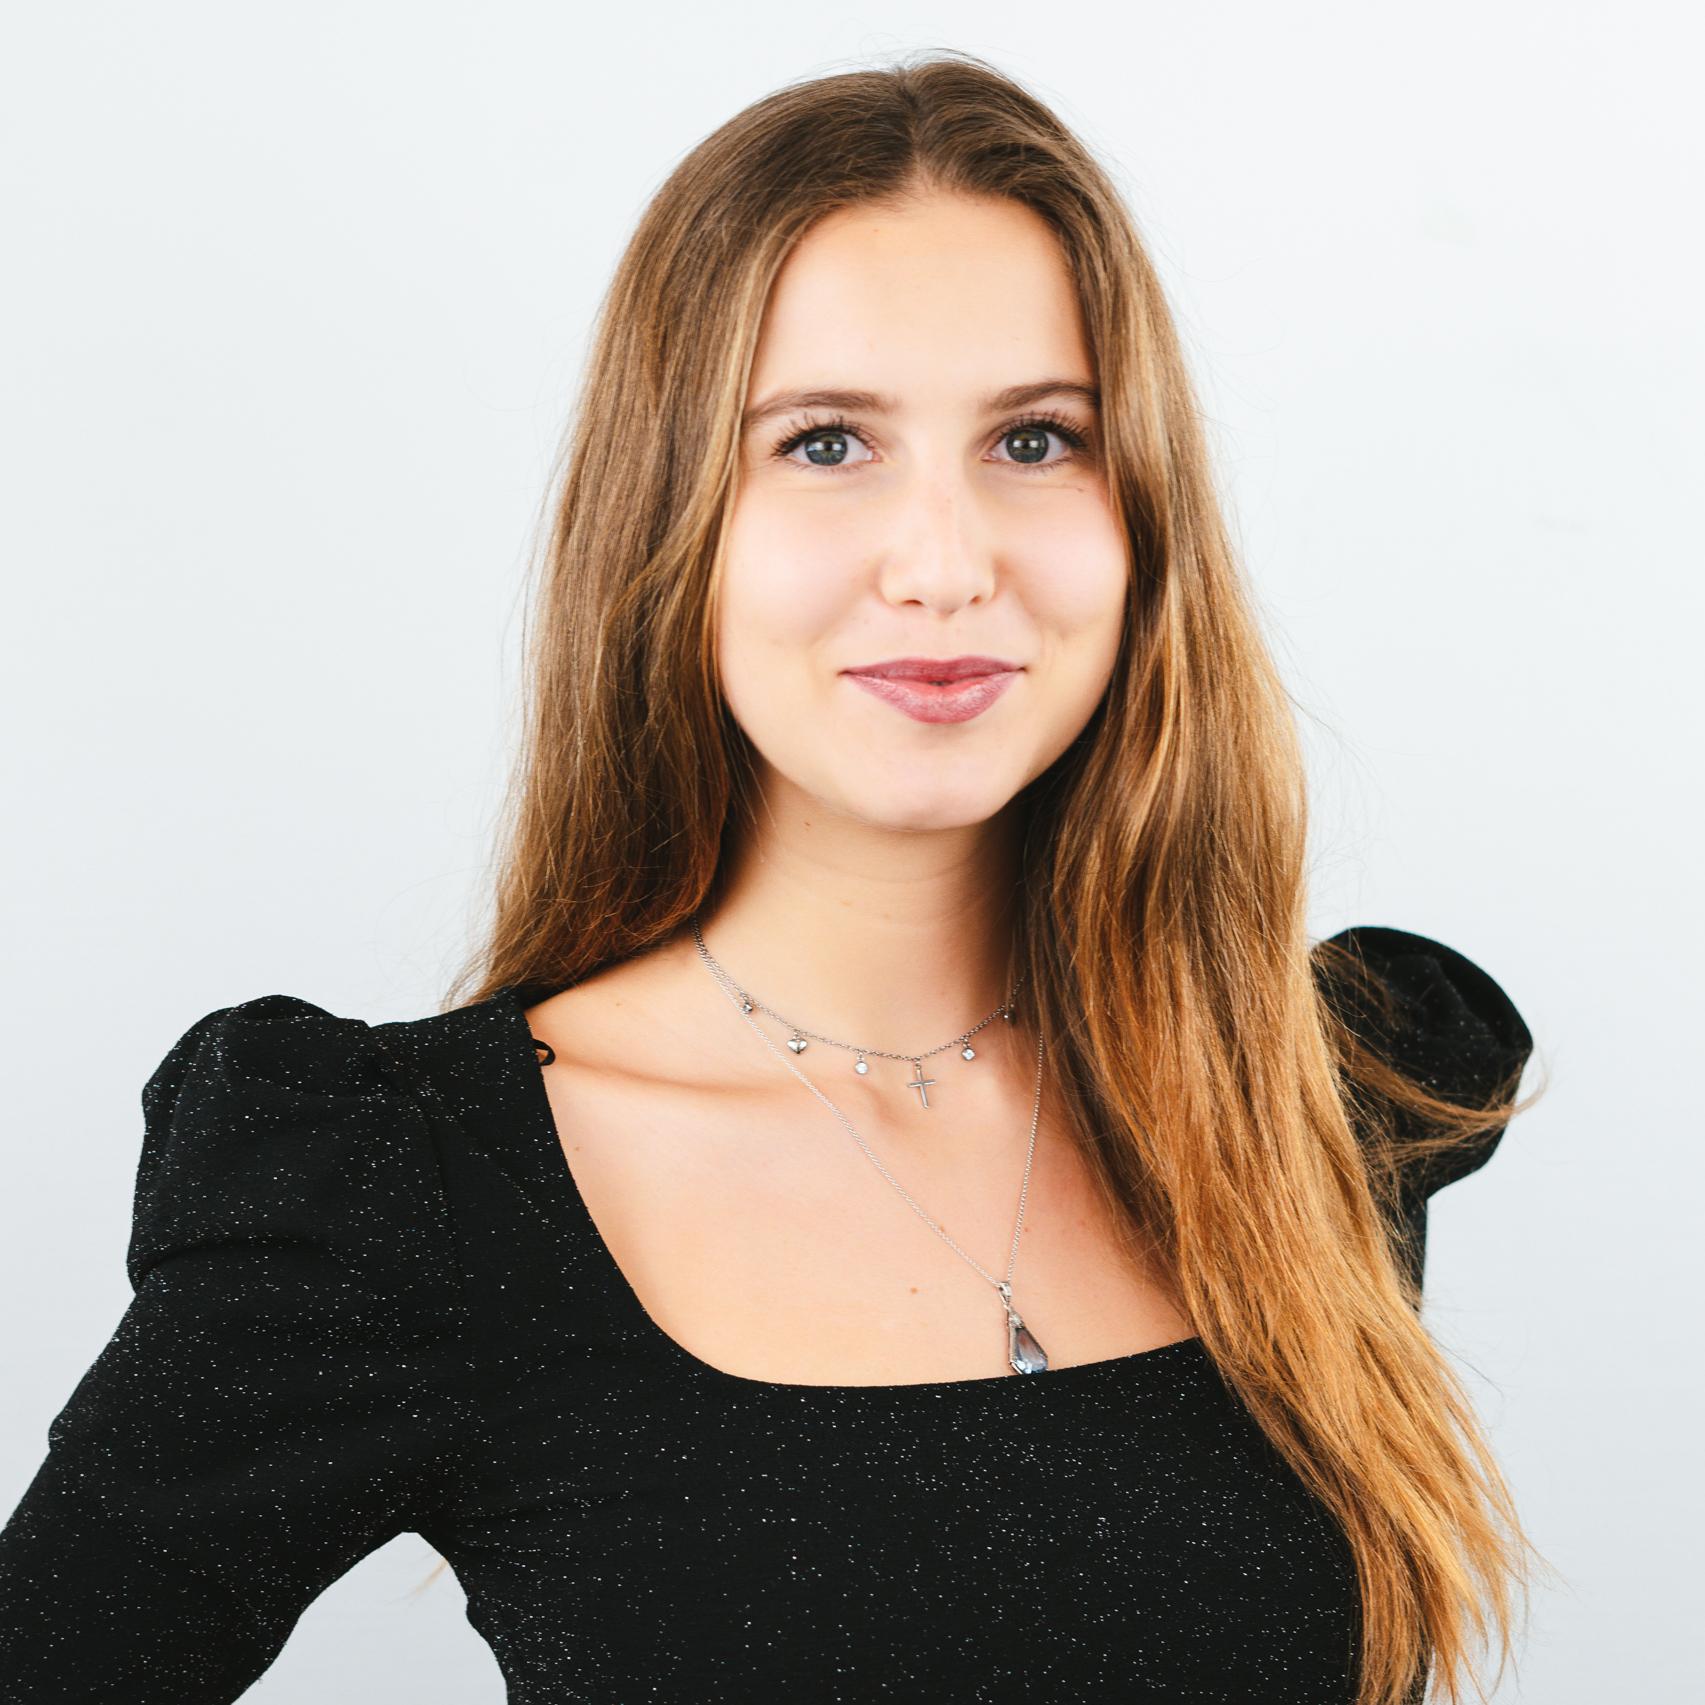 Lea-Mara Winzer